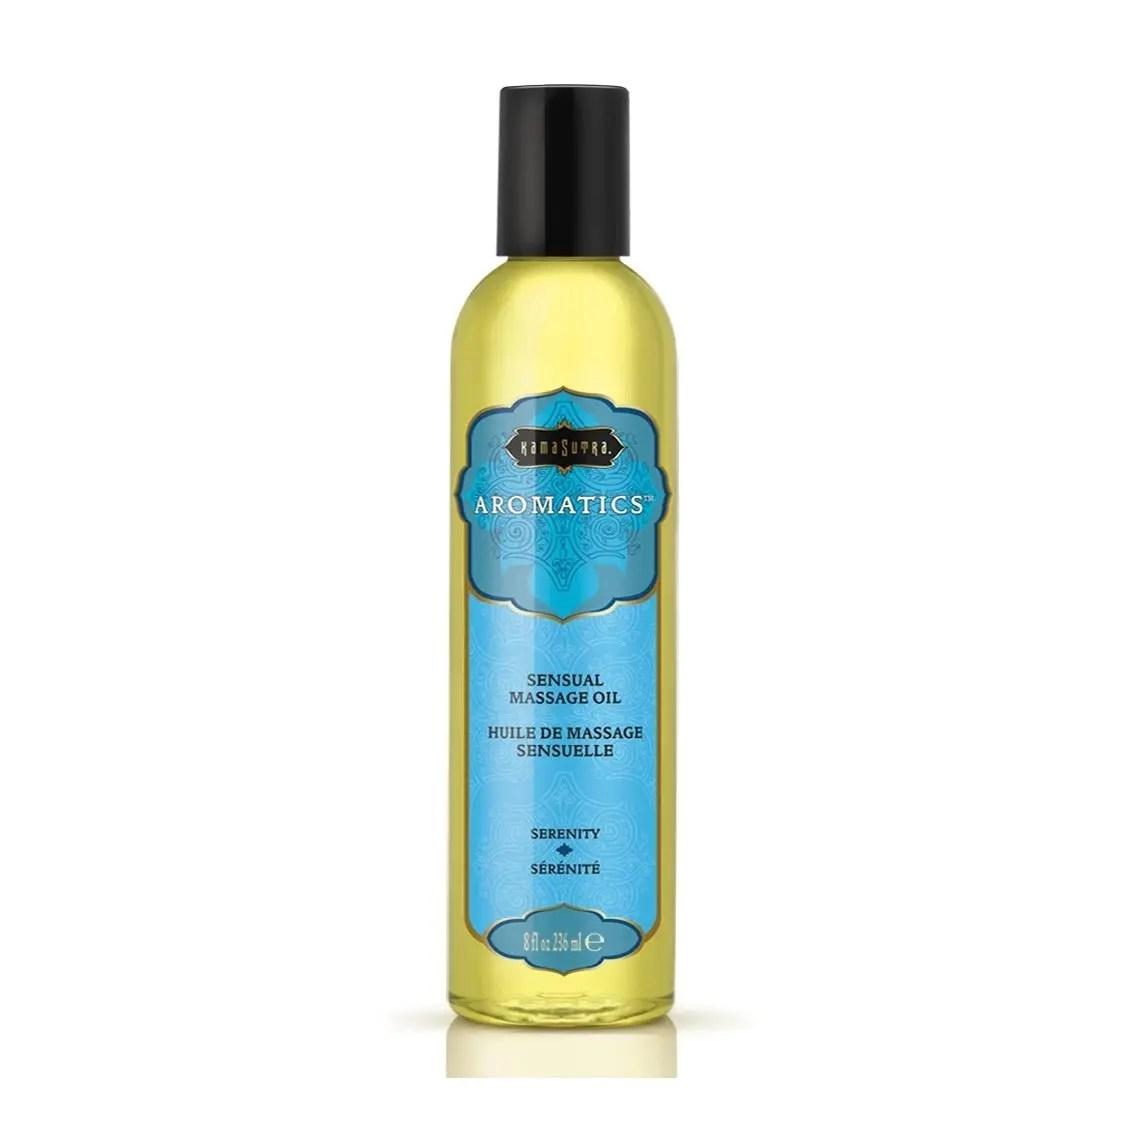 Kama Sutra Aromatic Massage Oil 8oz Serenity